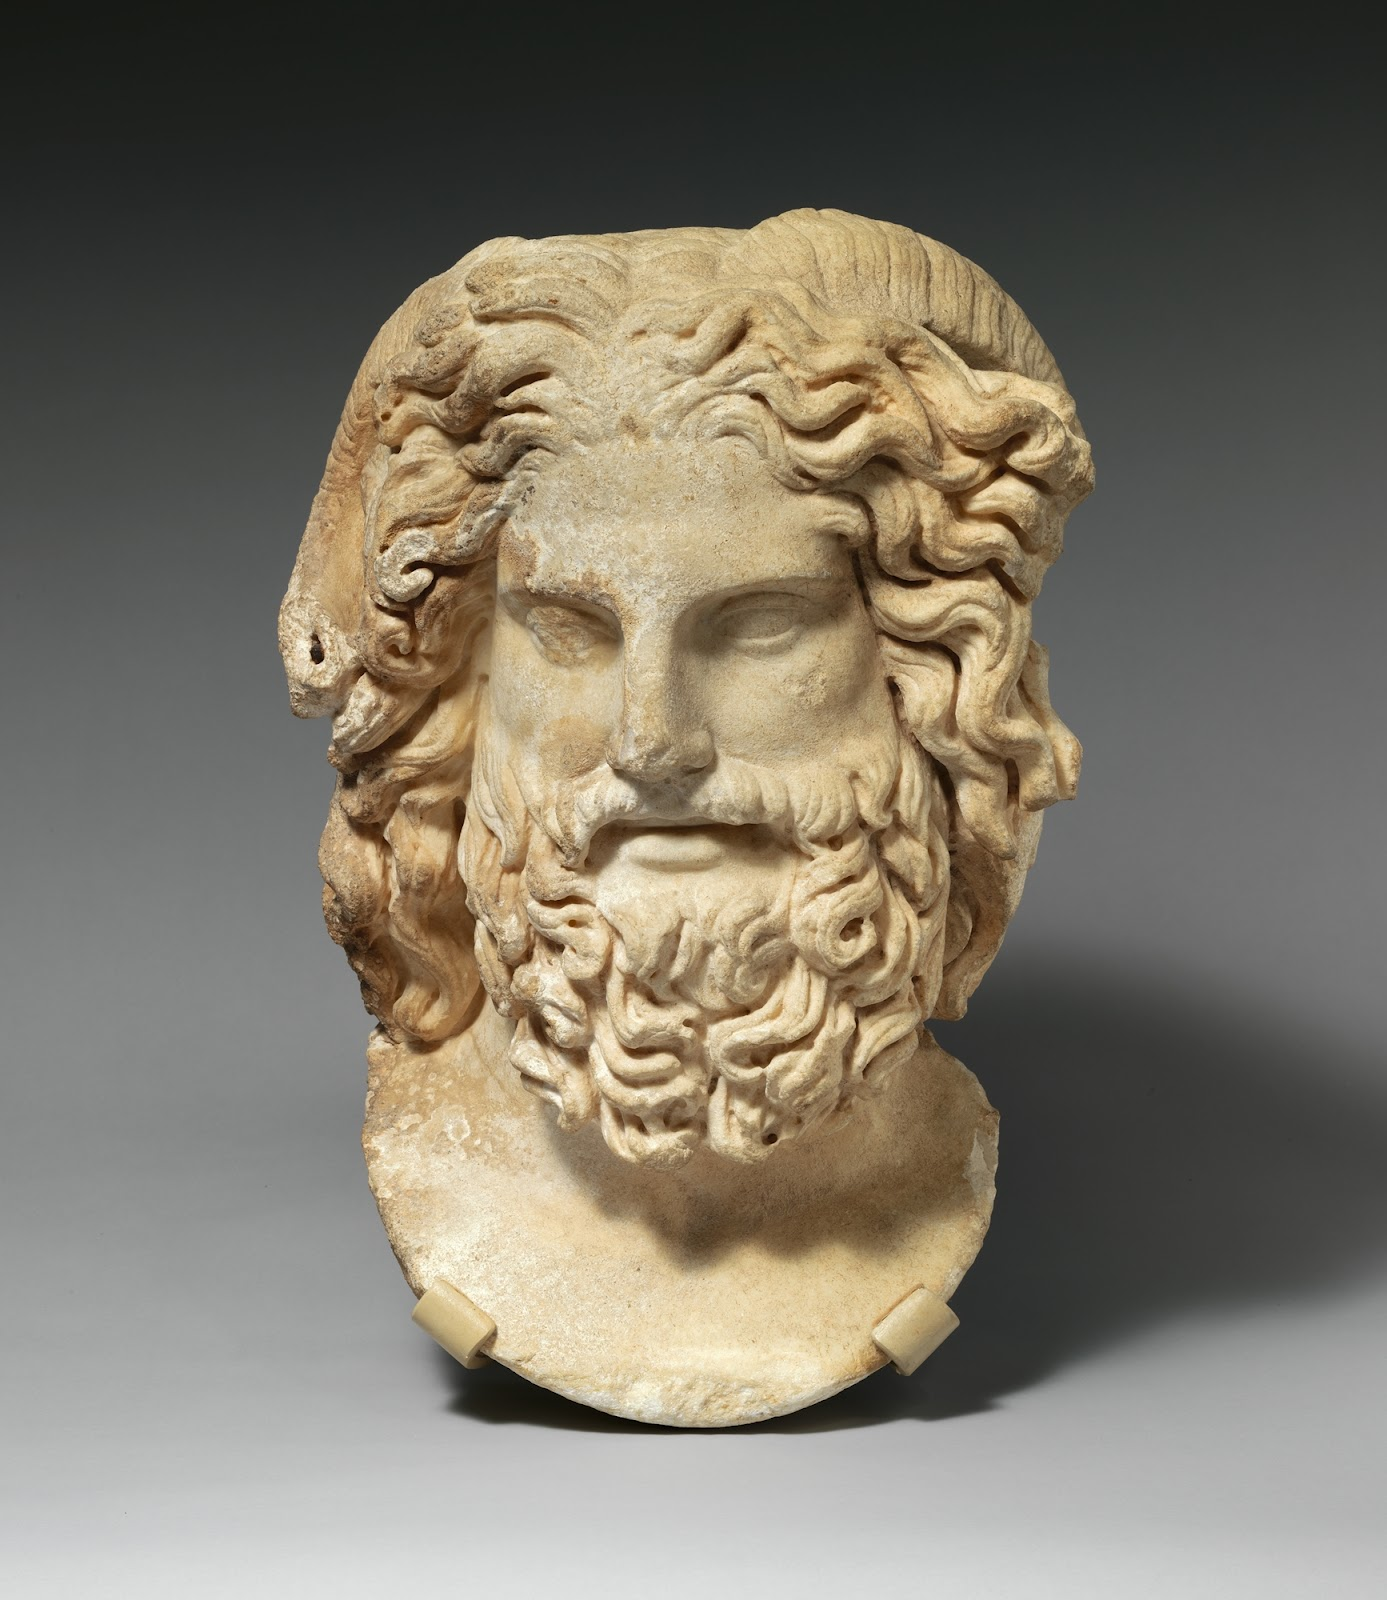 Six Ancient Greek Sculptures Everyone Should Know